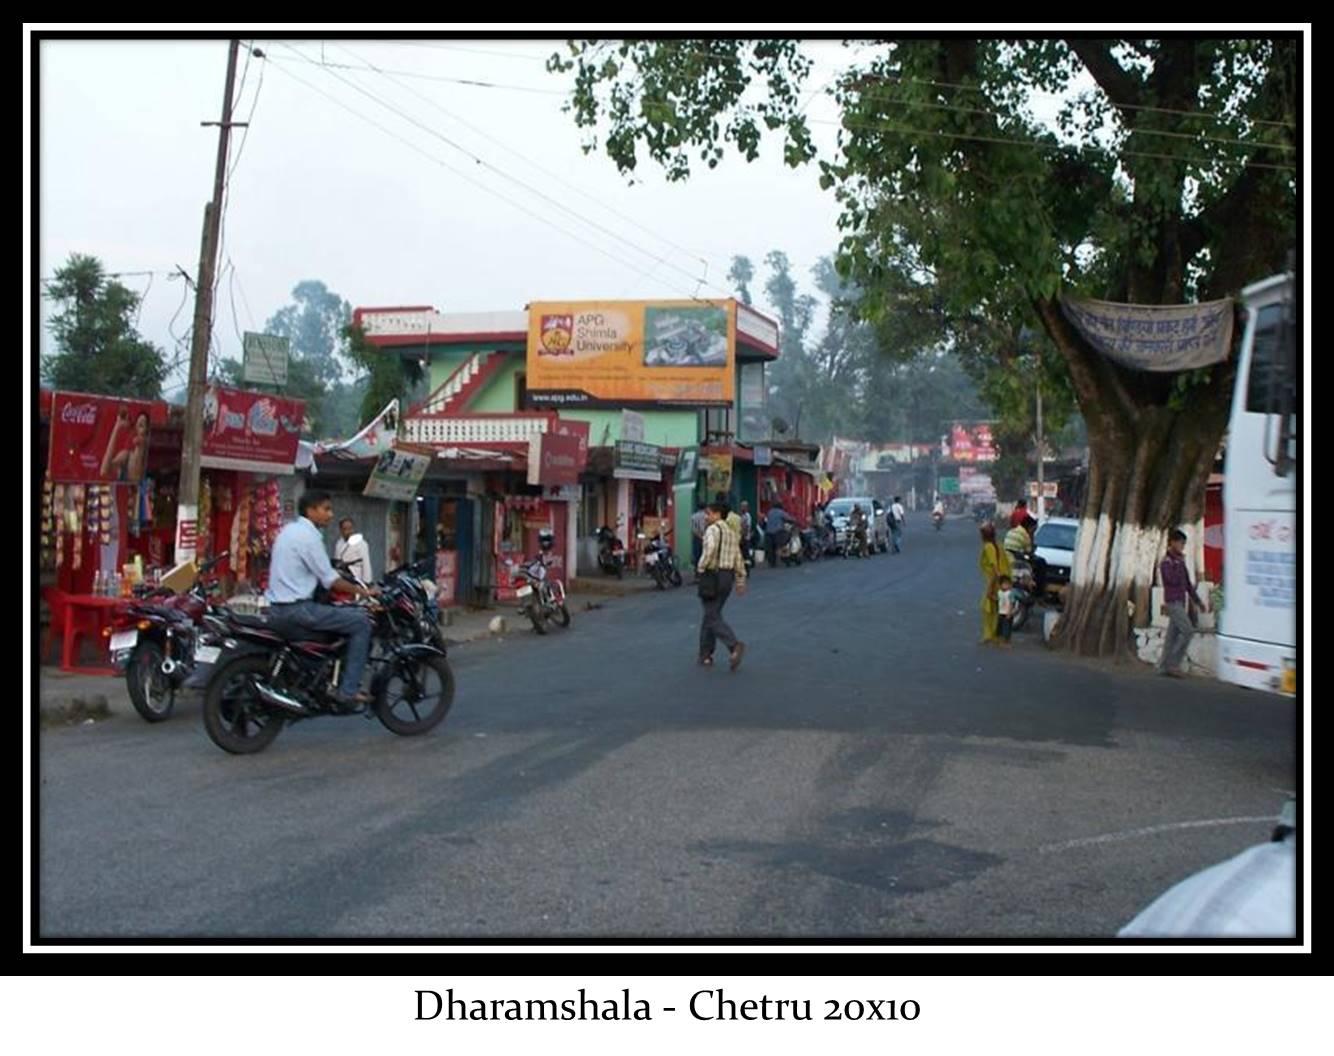 Chetru, Dharamshala